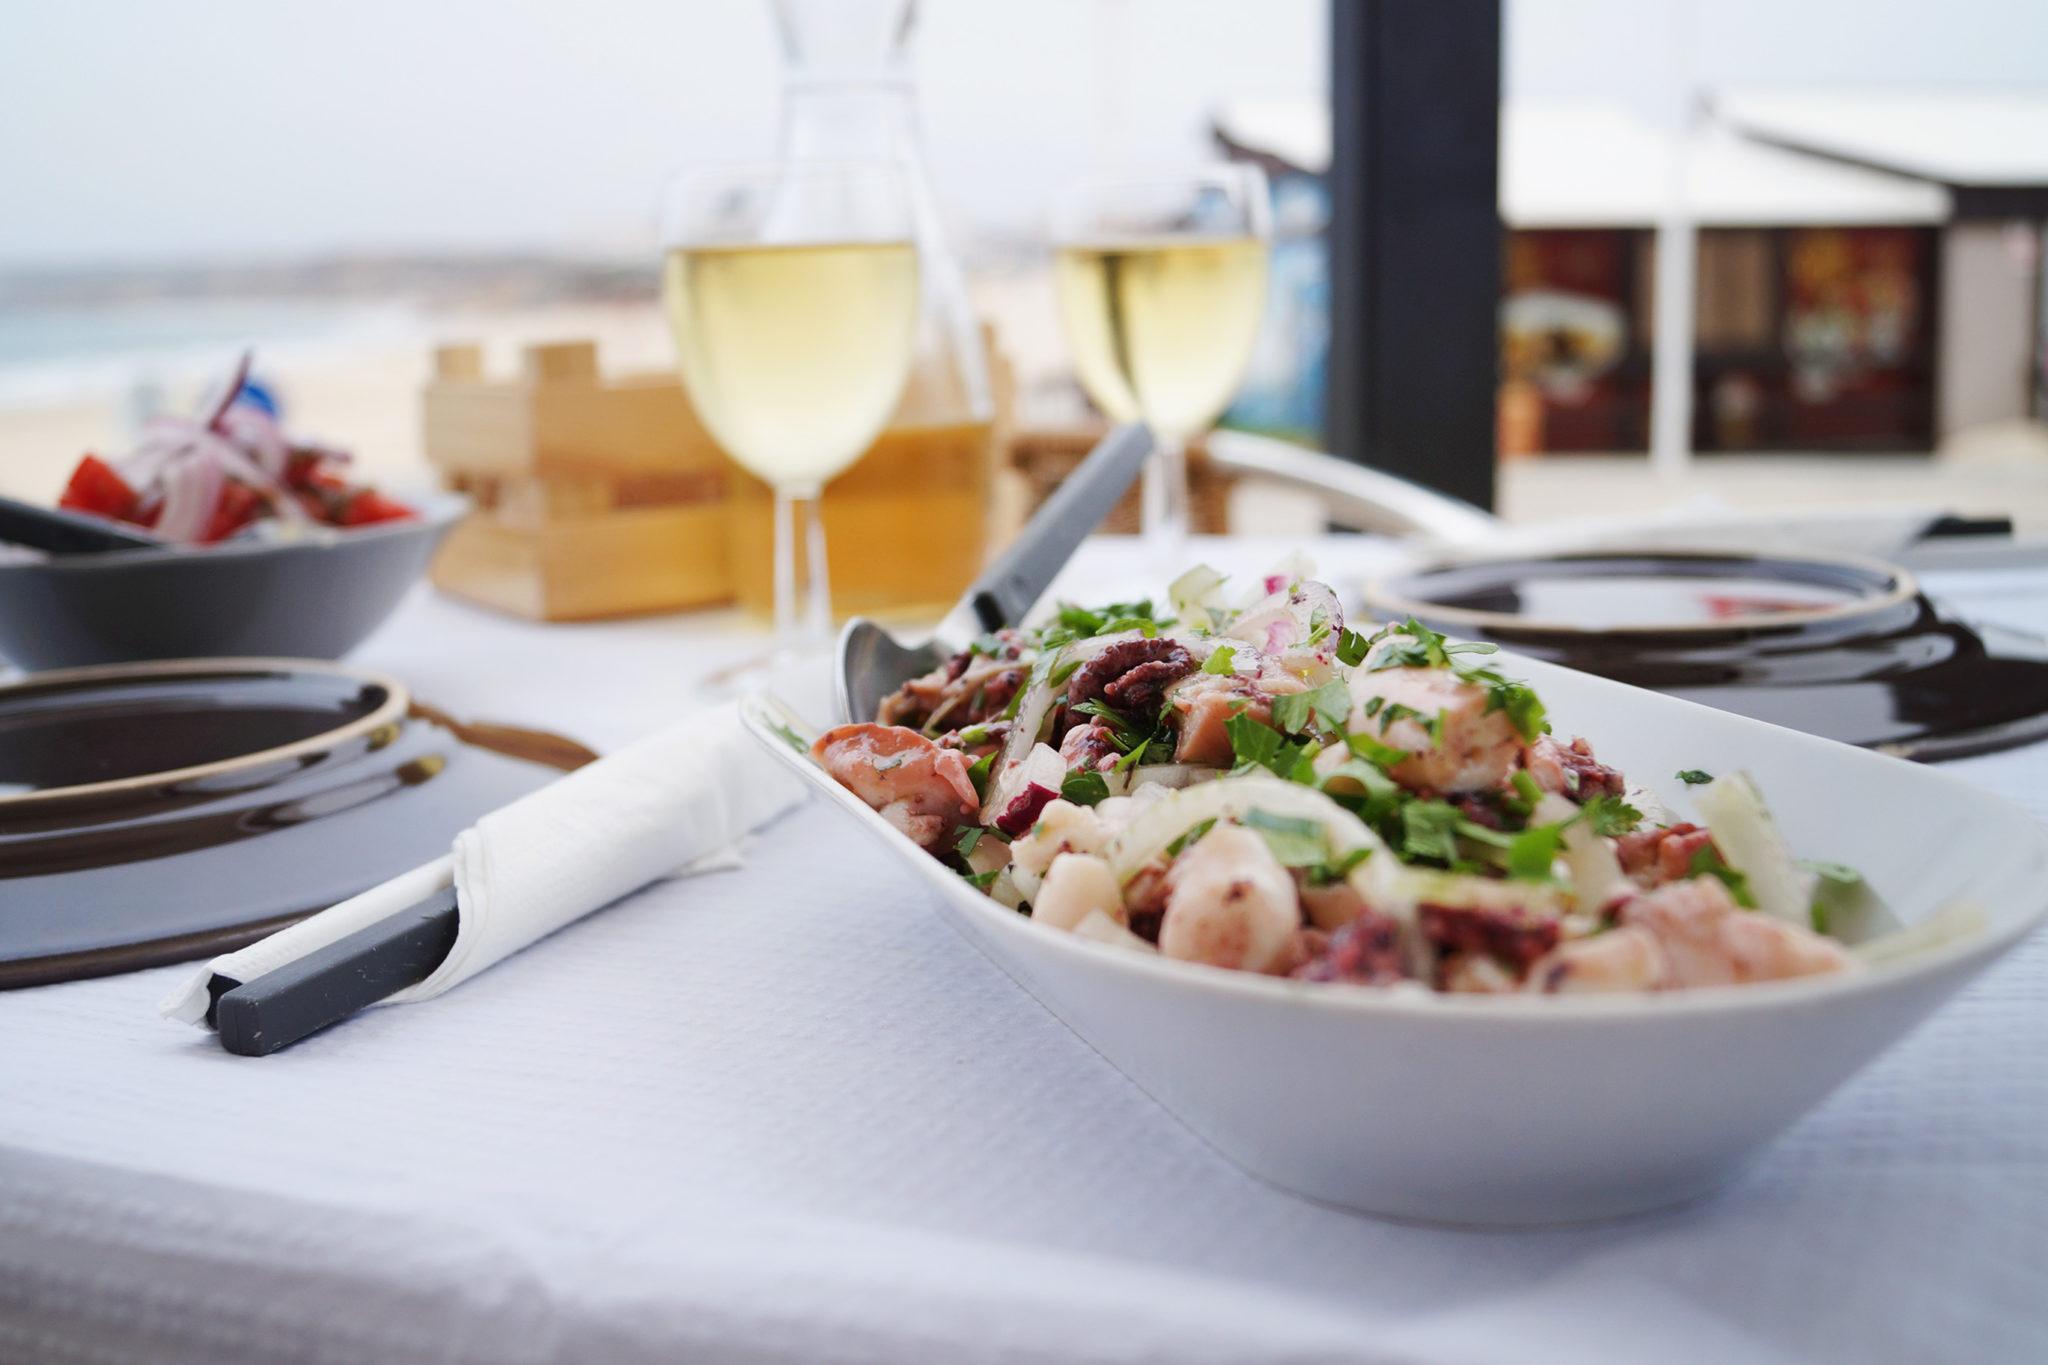 Peniche-Restaurants-Octopussalad-Taberna-do-Ganhao